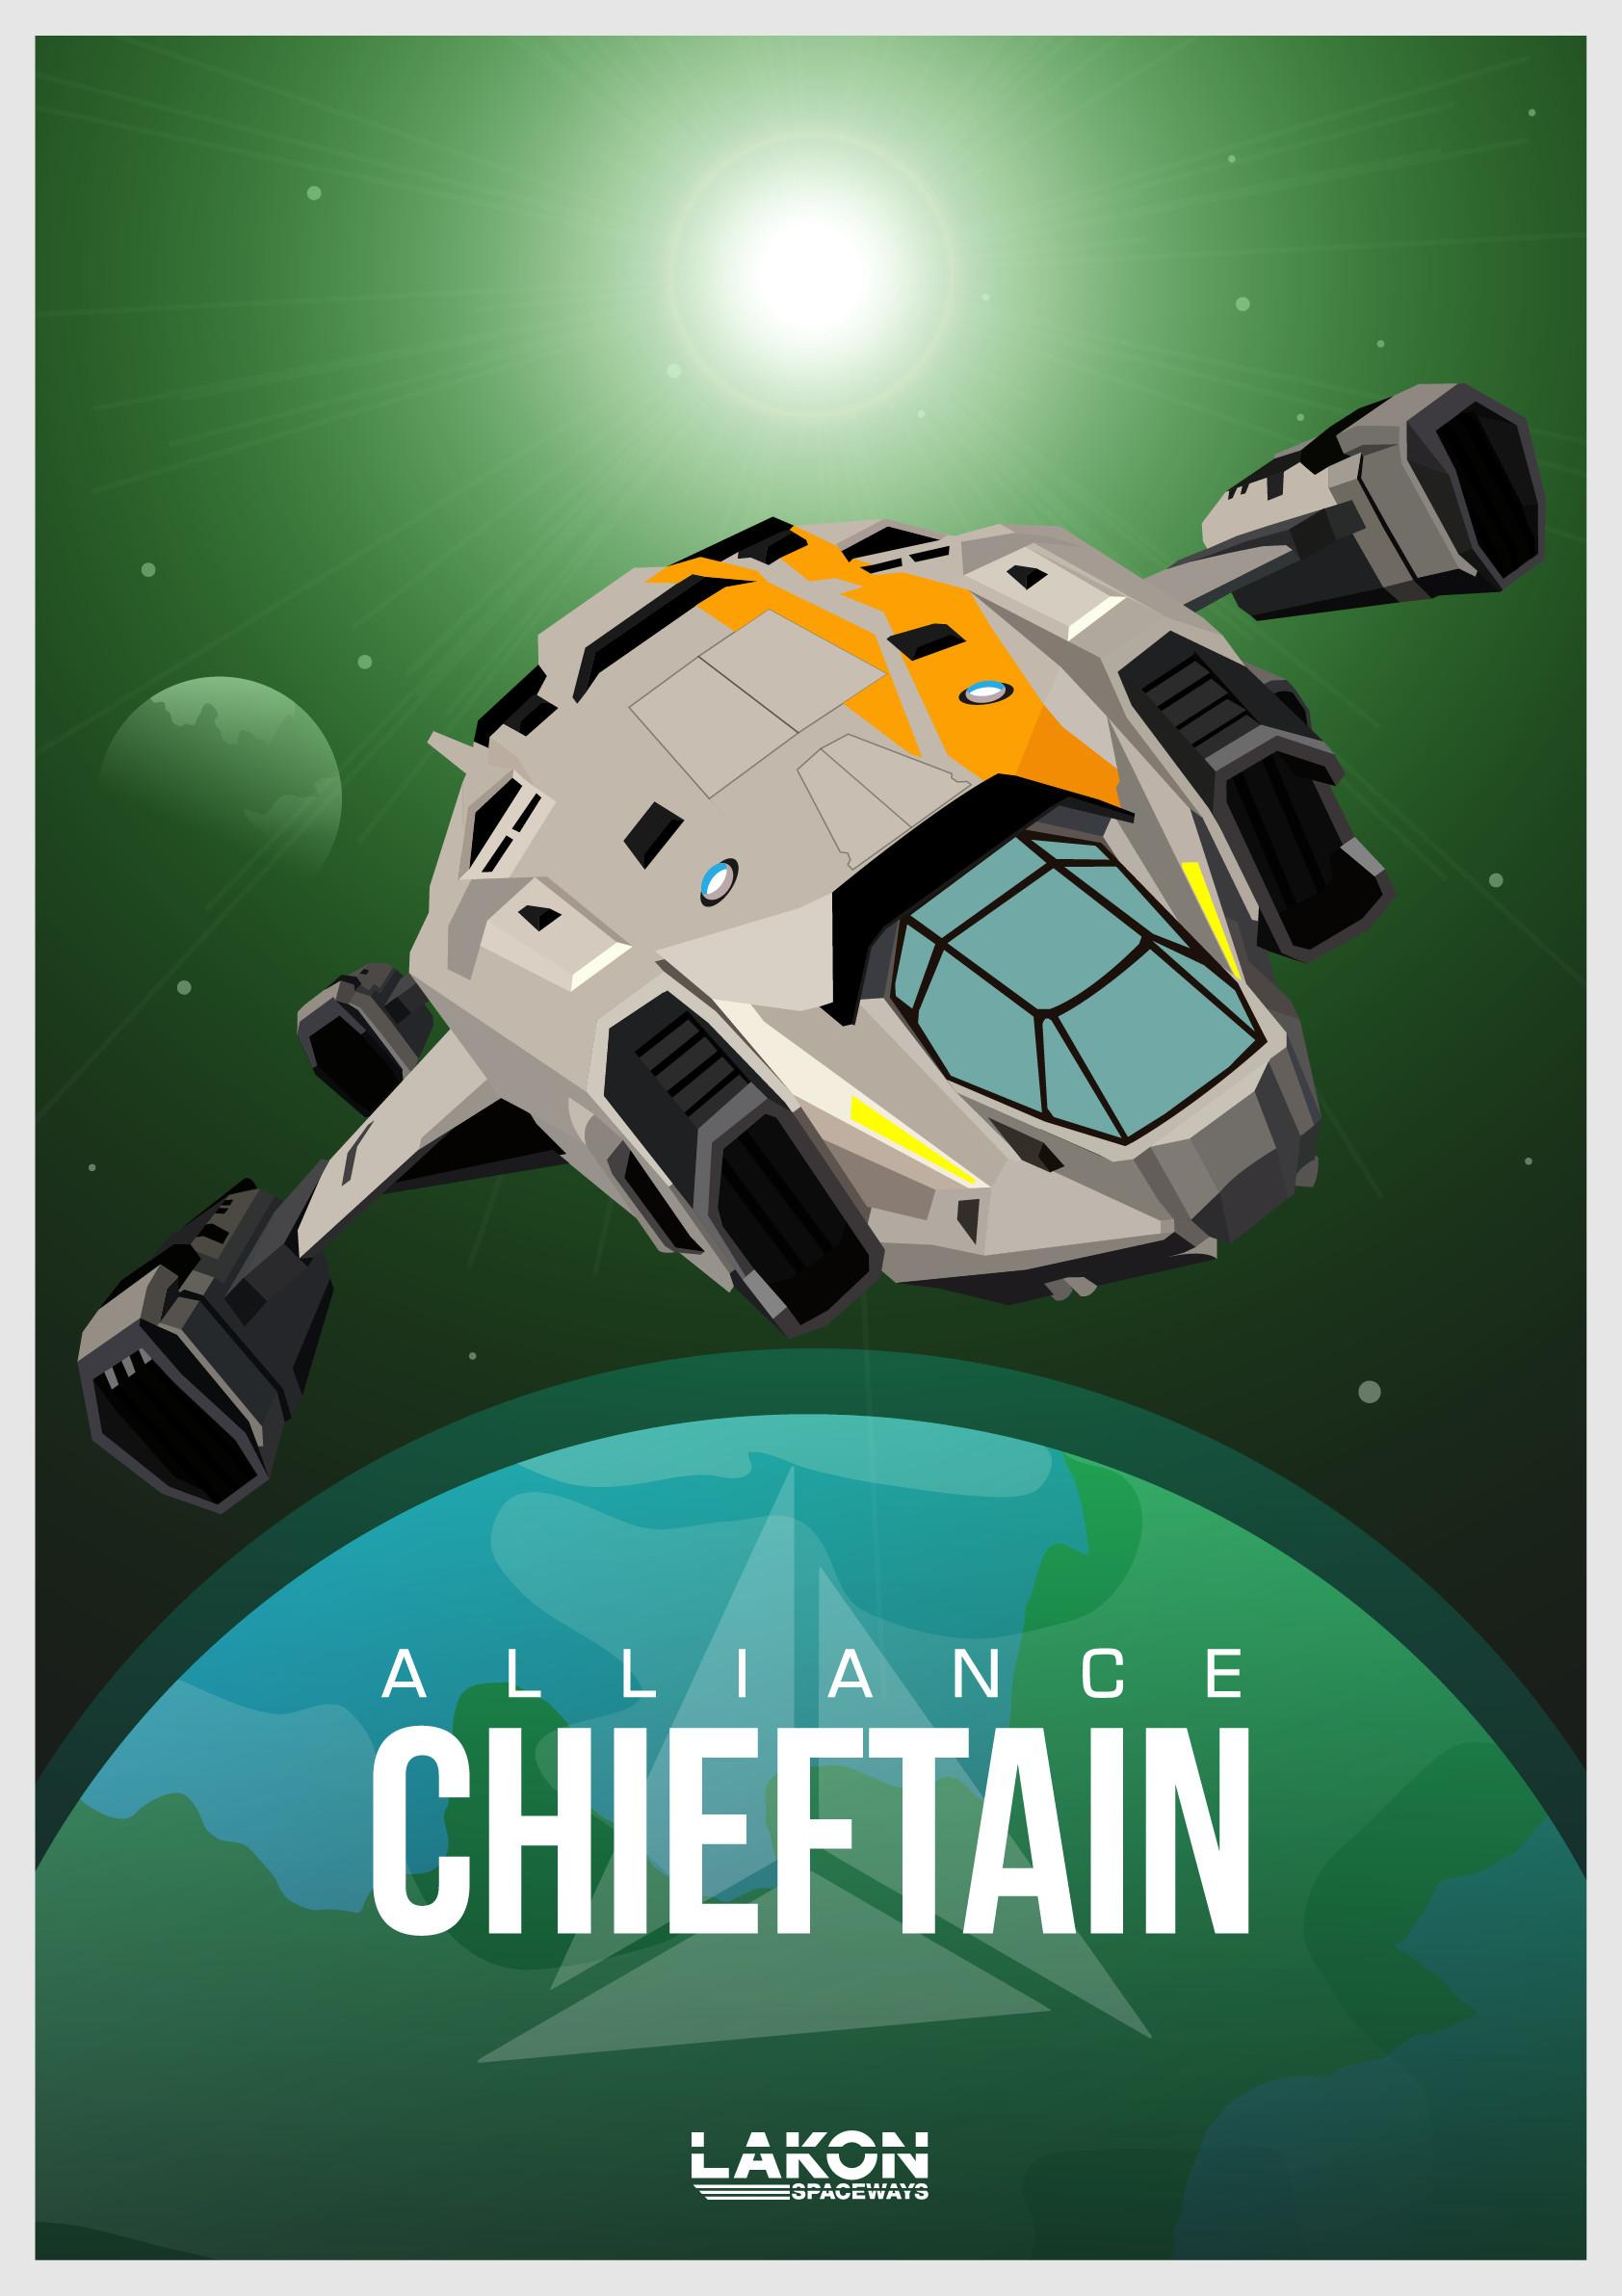 The Alliance Chieftain